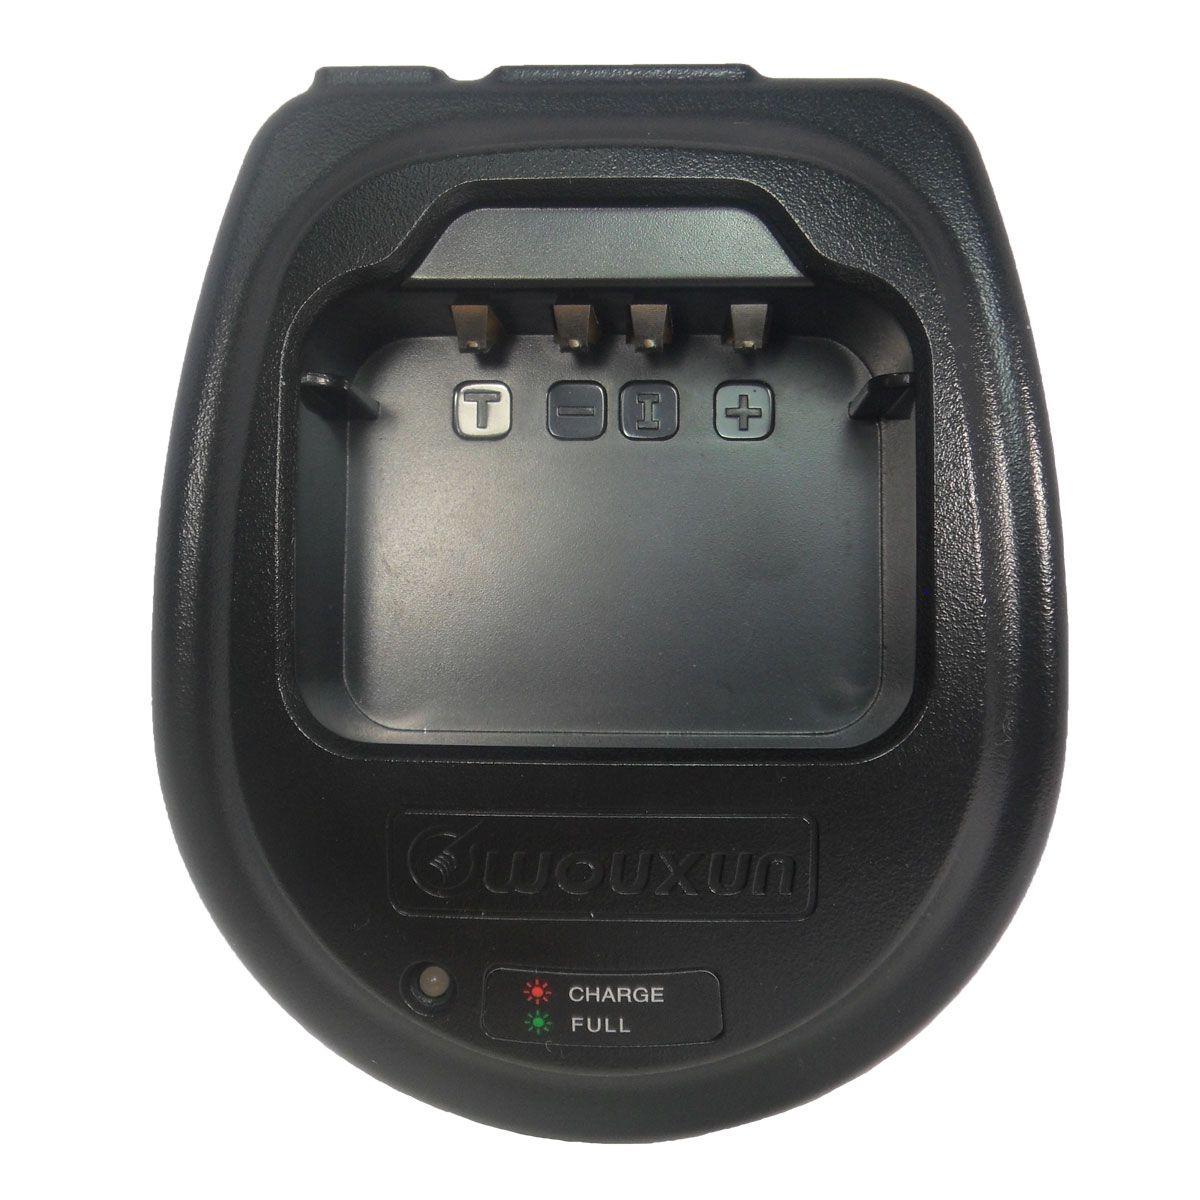 Cargador individual Wouxun de carga rápida CH-006